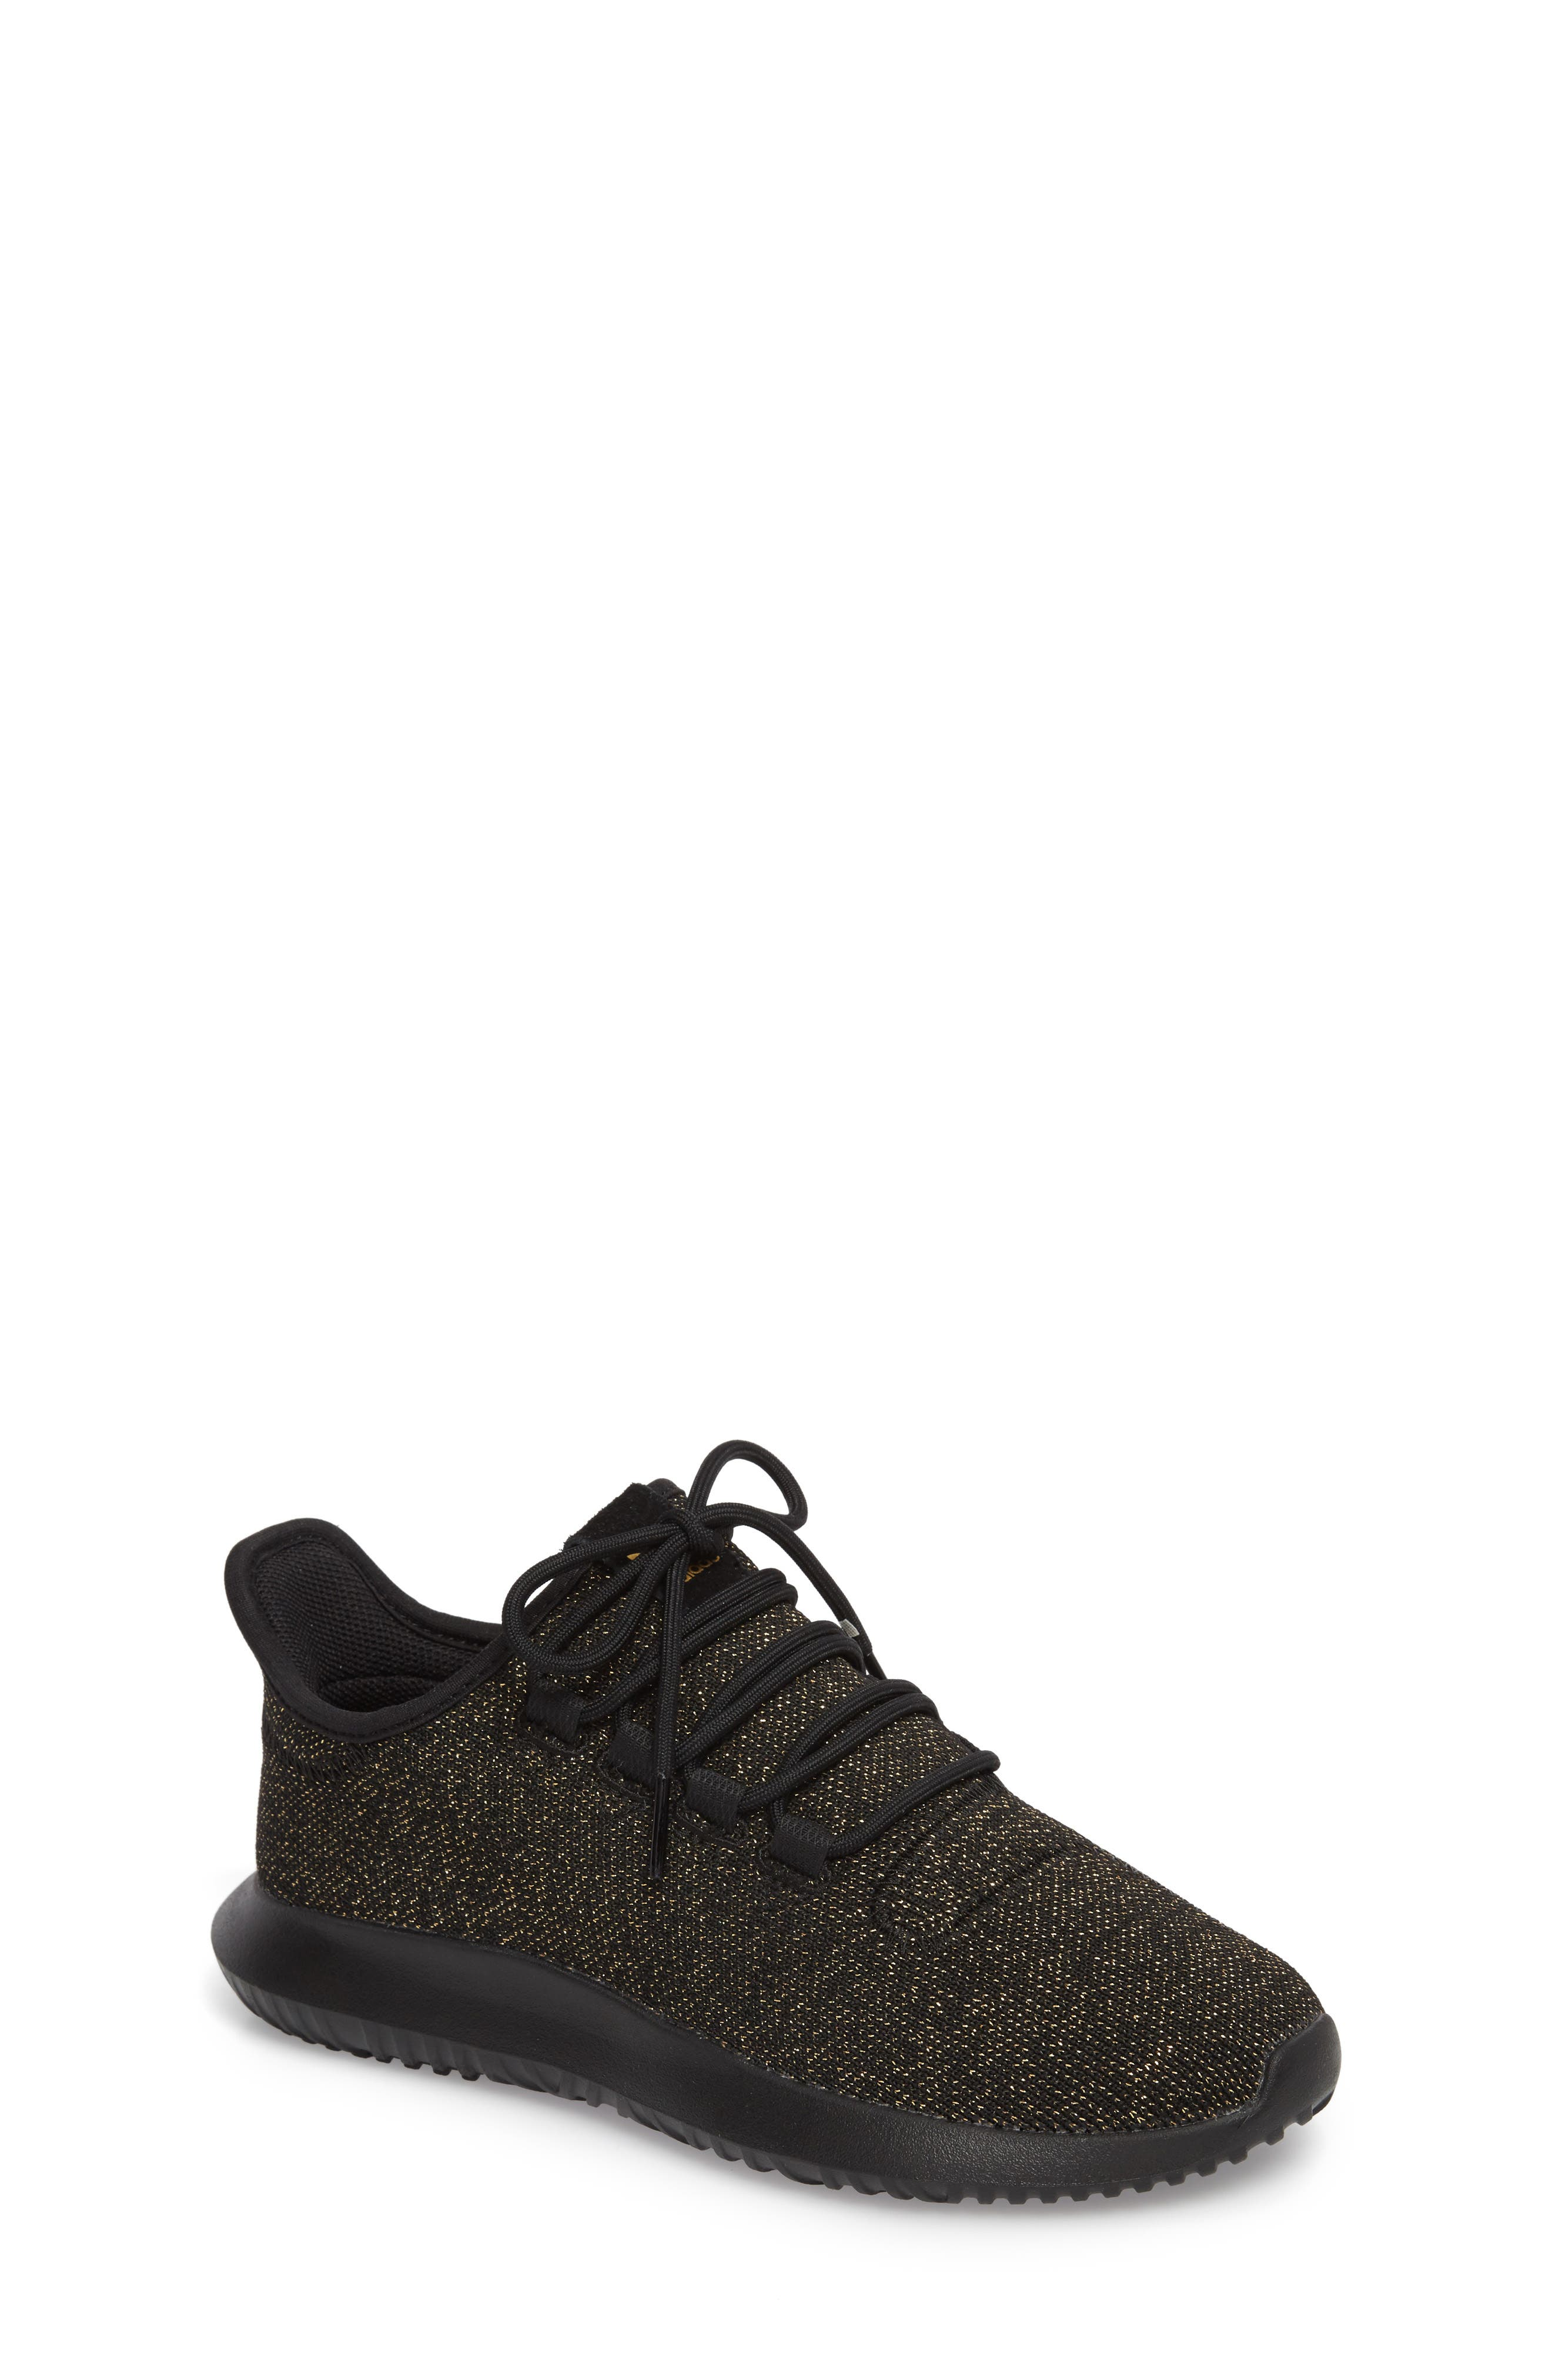 Tubular Shadow Sneaker,                         Main,                         color, Core Black